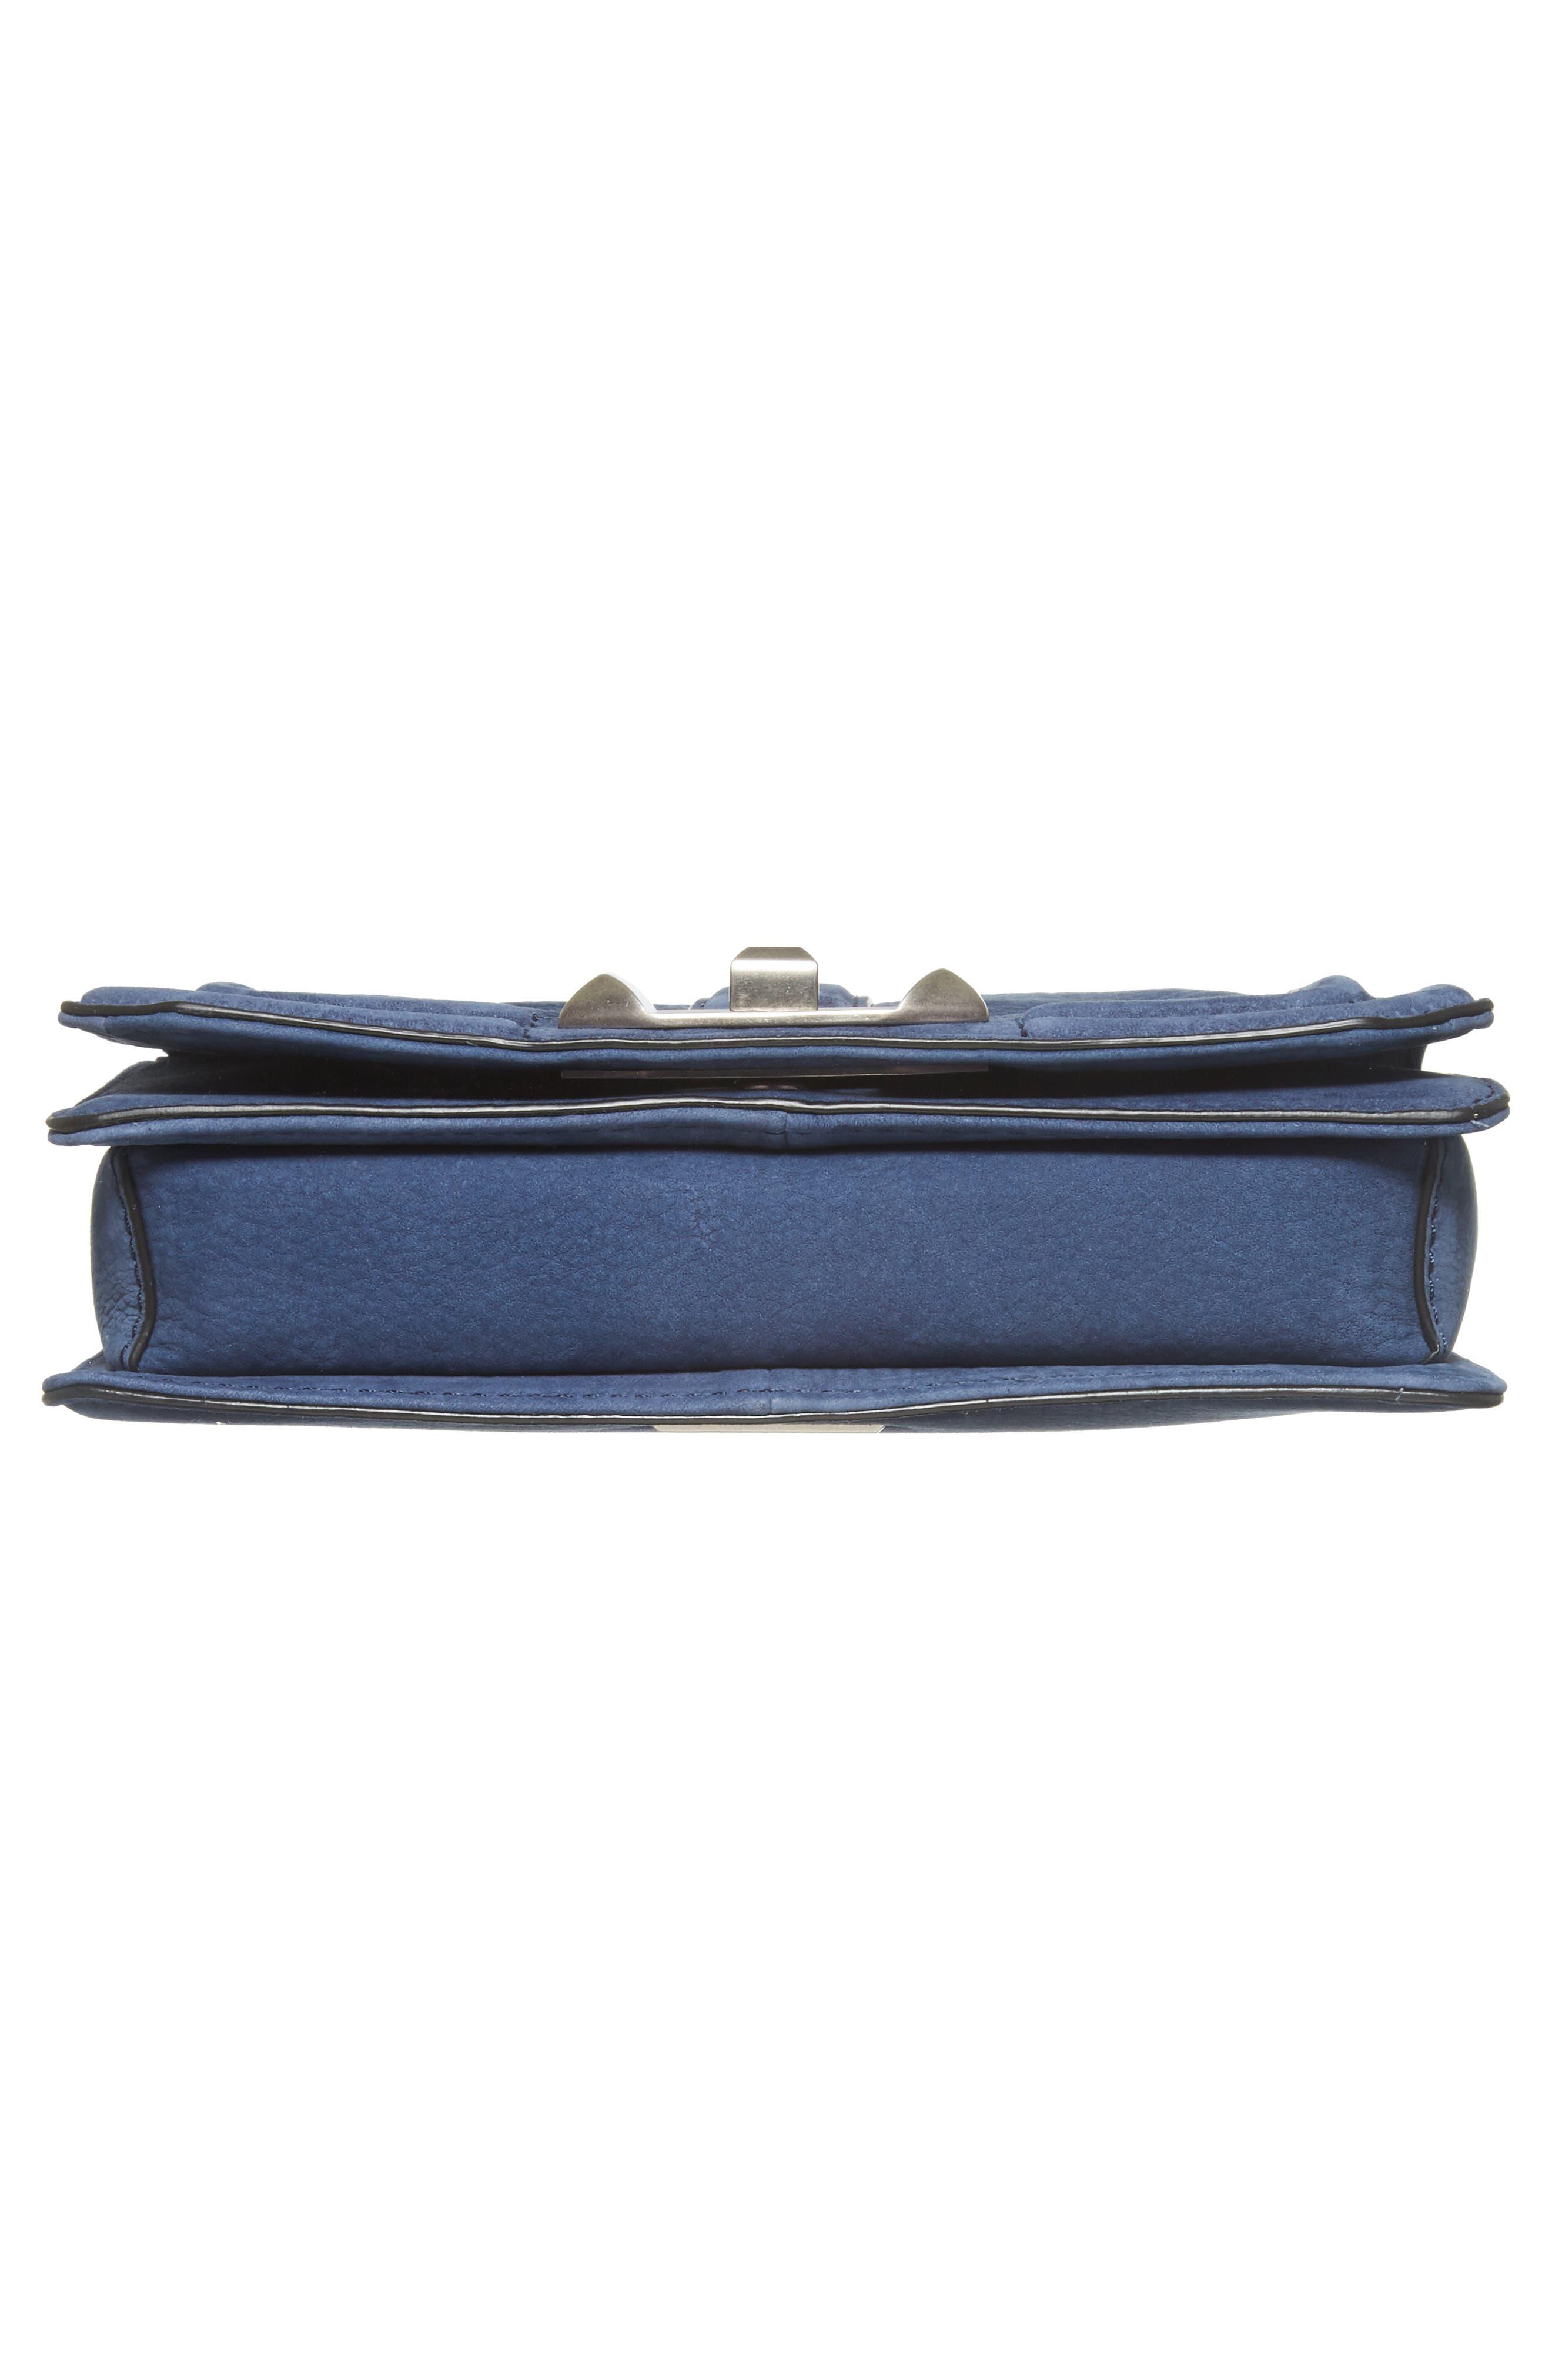 Small Love Nubuck Leather Crossbody Bag,                             Alternate thumbnail 6, color,                             True Navy